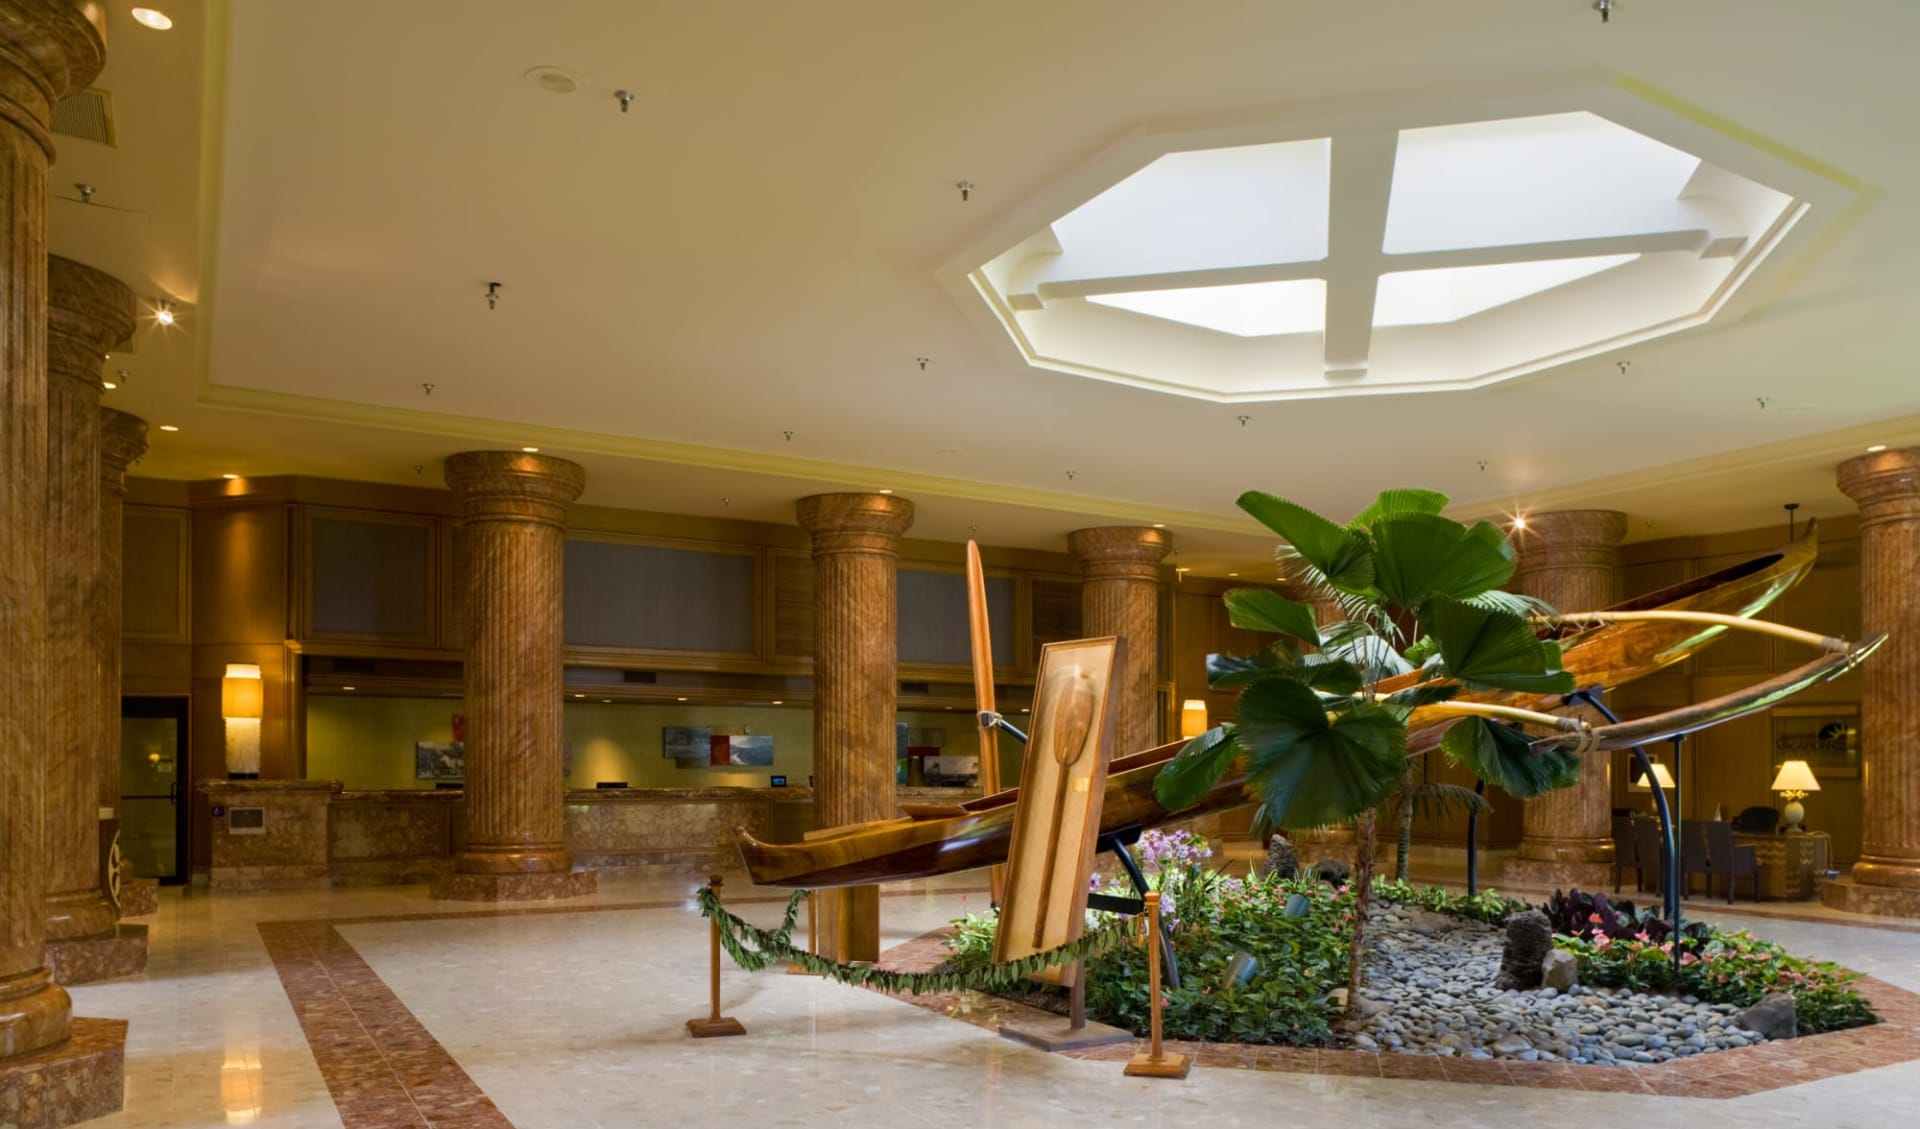 Royal Sonesta Kaua'i Resort Lihue in Lihue - Kauai:  Lobby